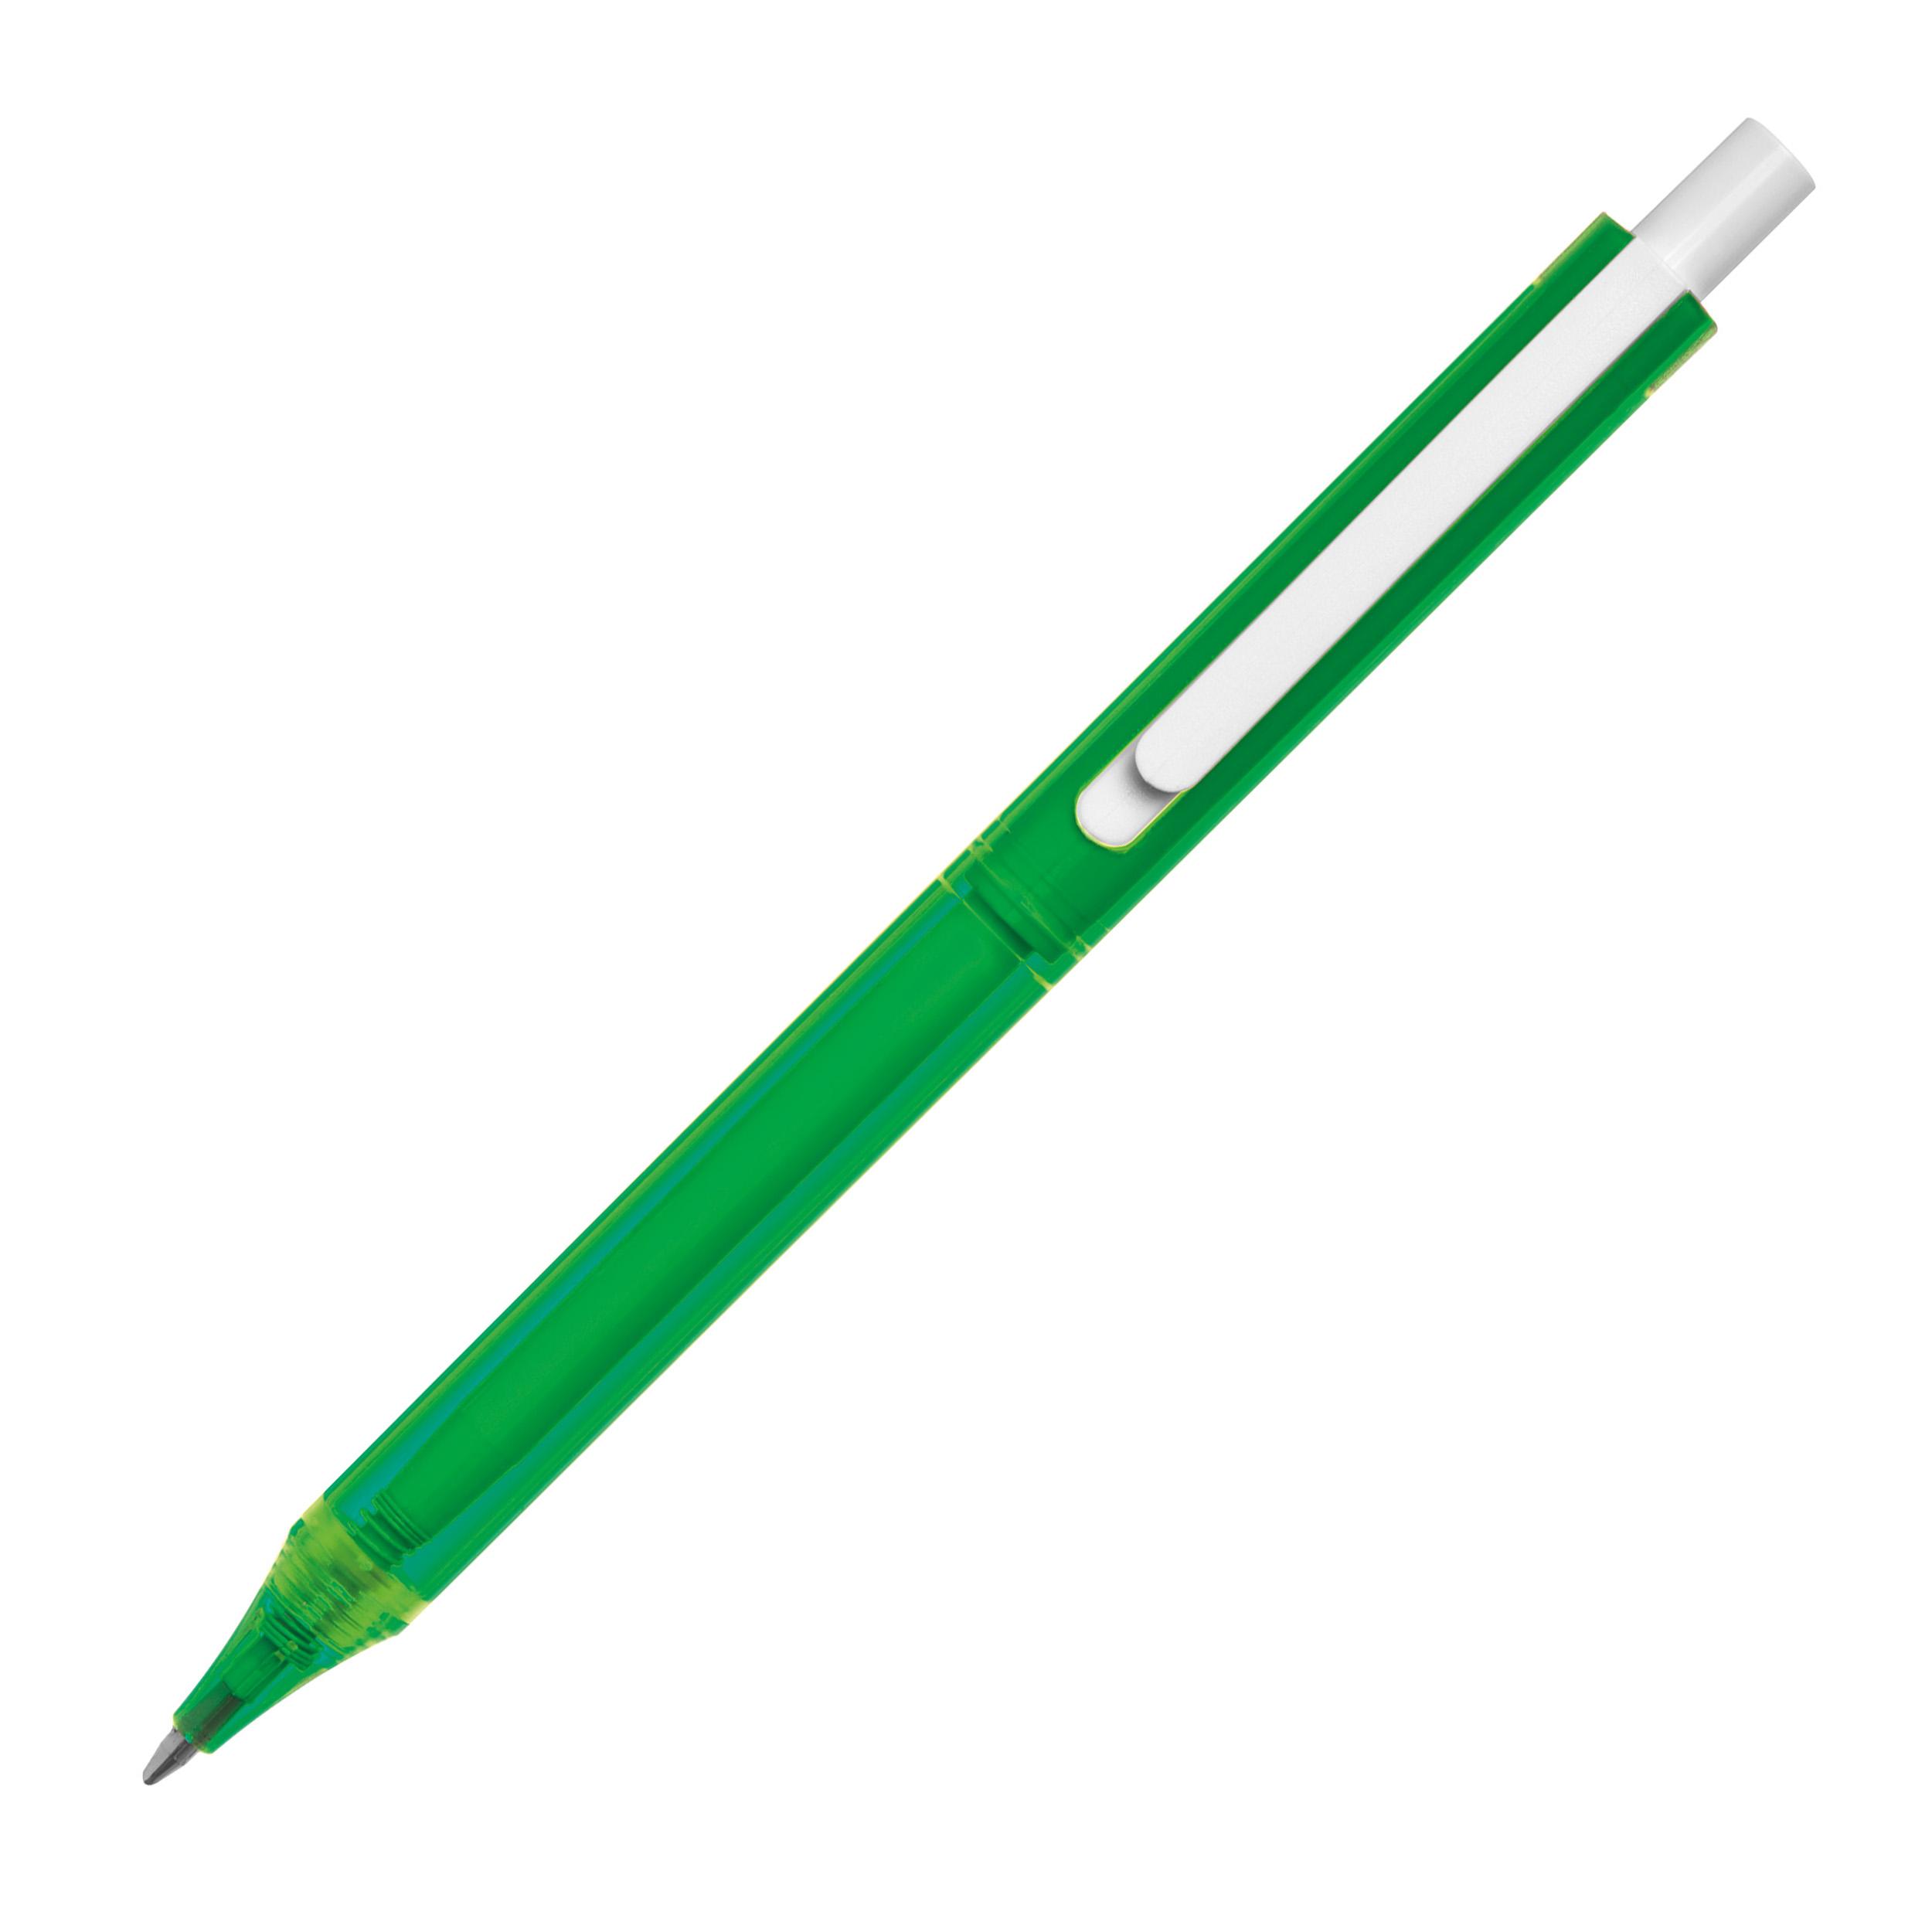 Transparent plastic ball pen